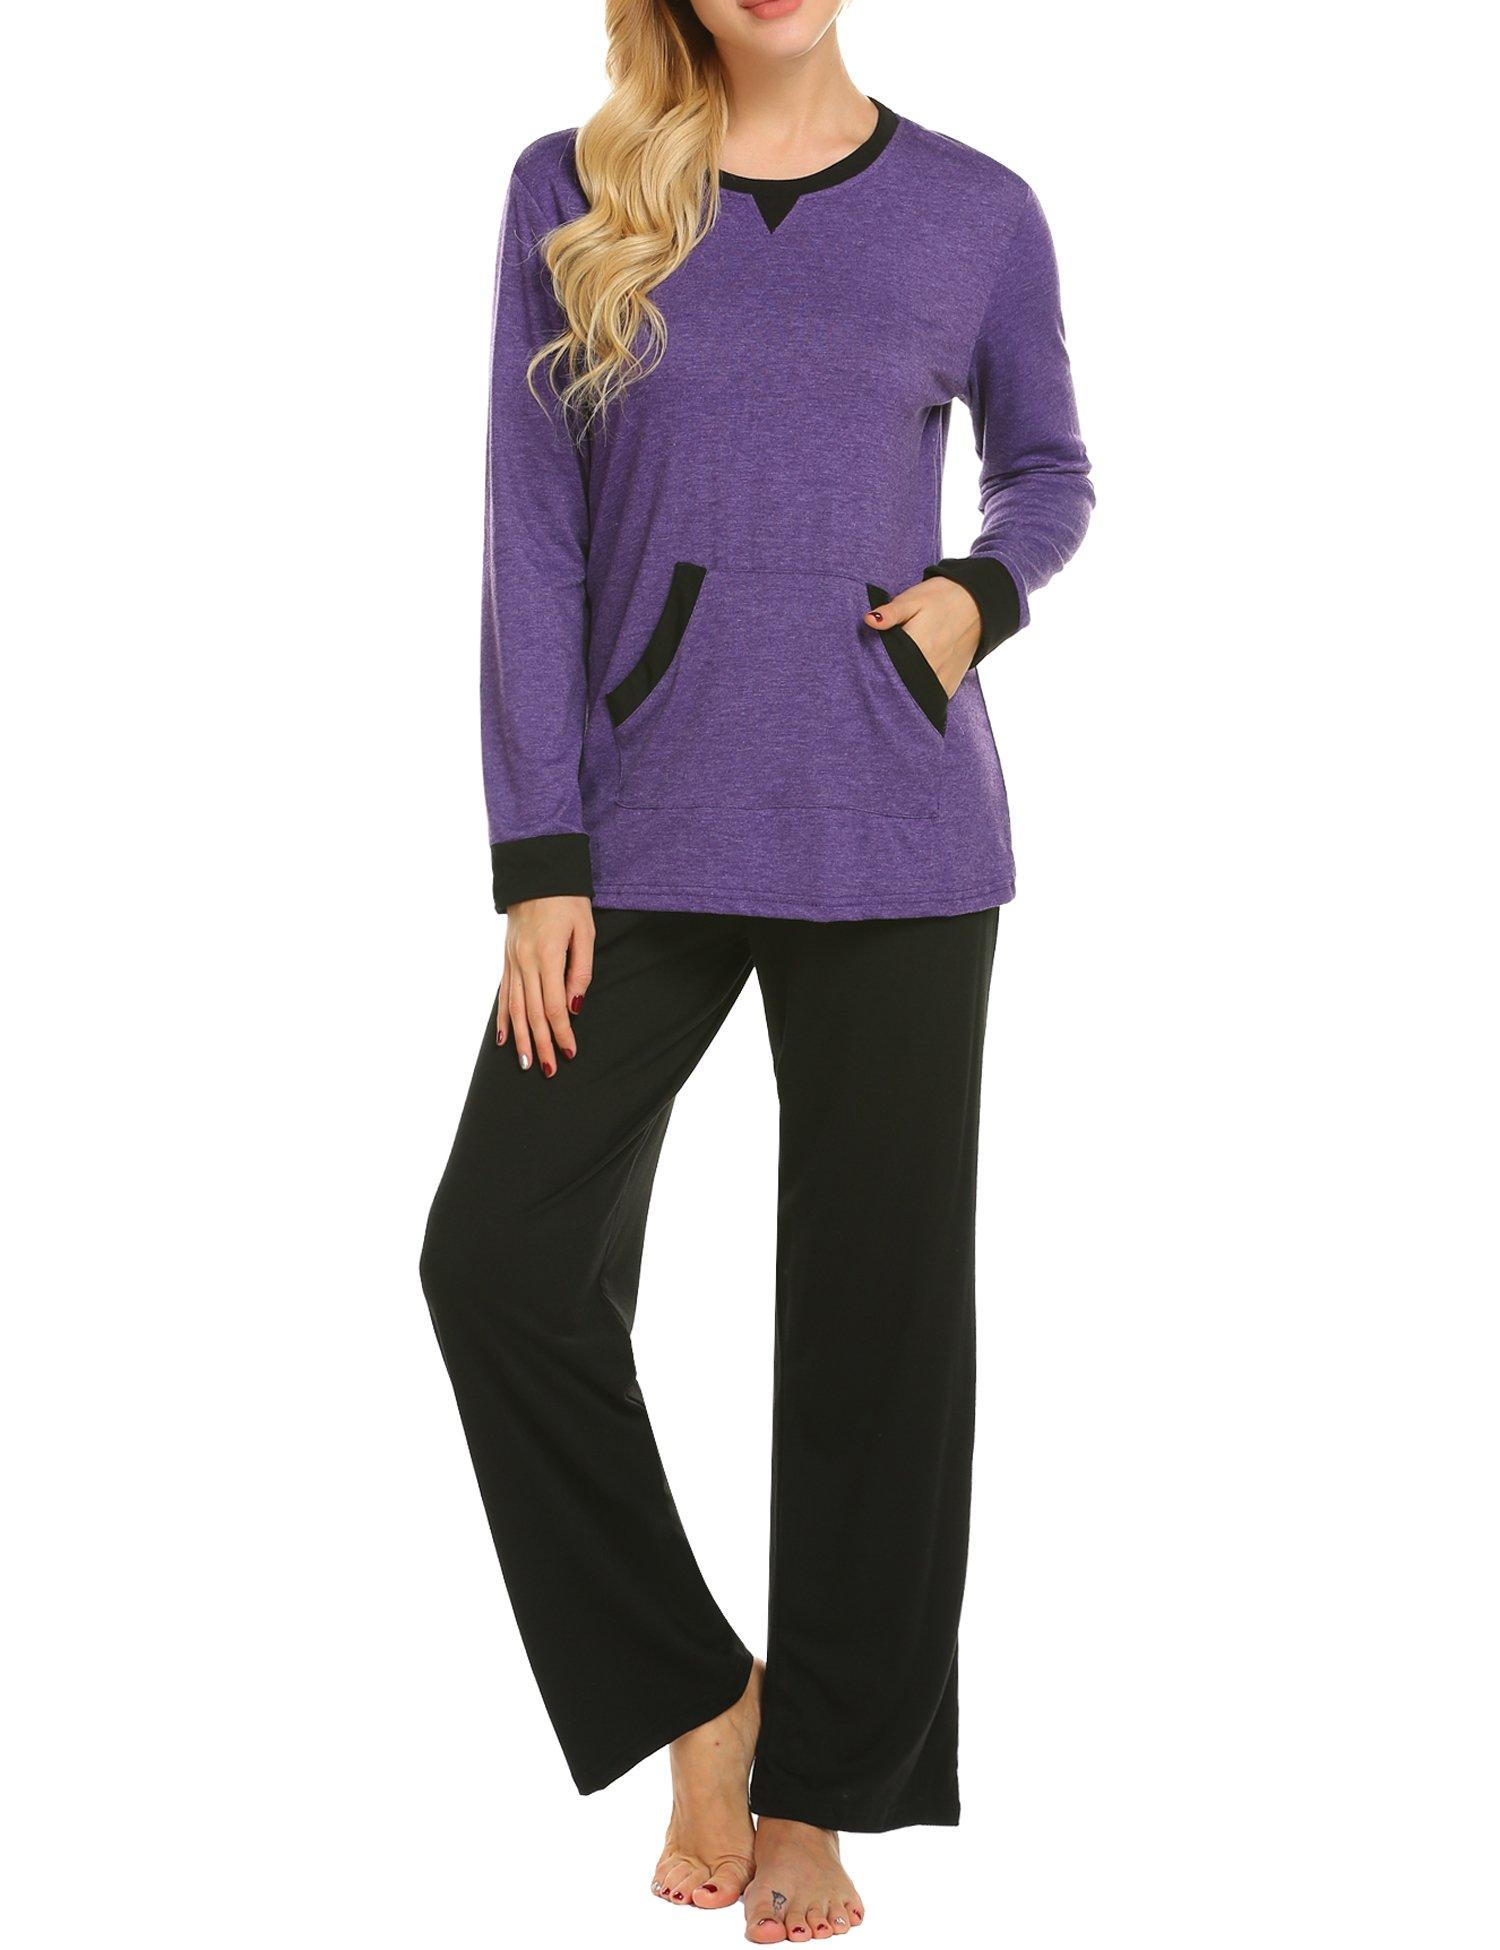 MAXMODA Soft Pajamas Long Sleeve Sleepwear Soft PJ Set with Pants Purple L by MAXMODA (Image #1)